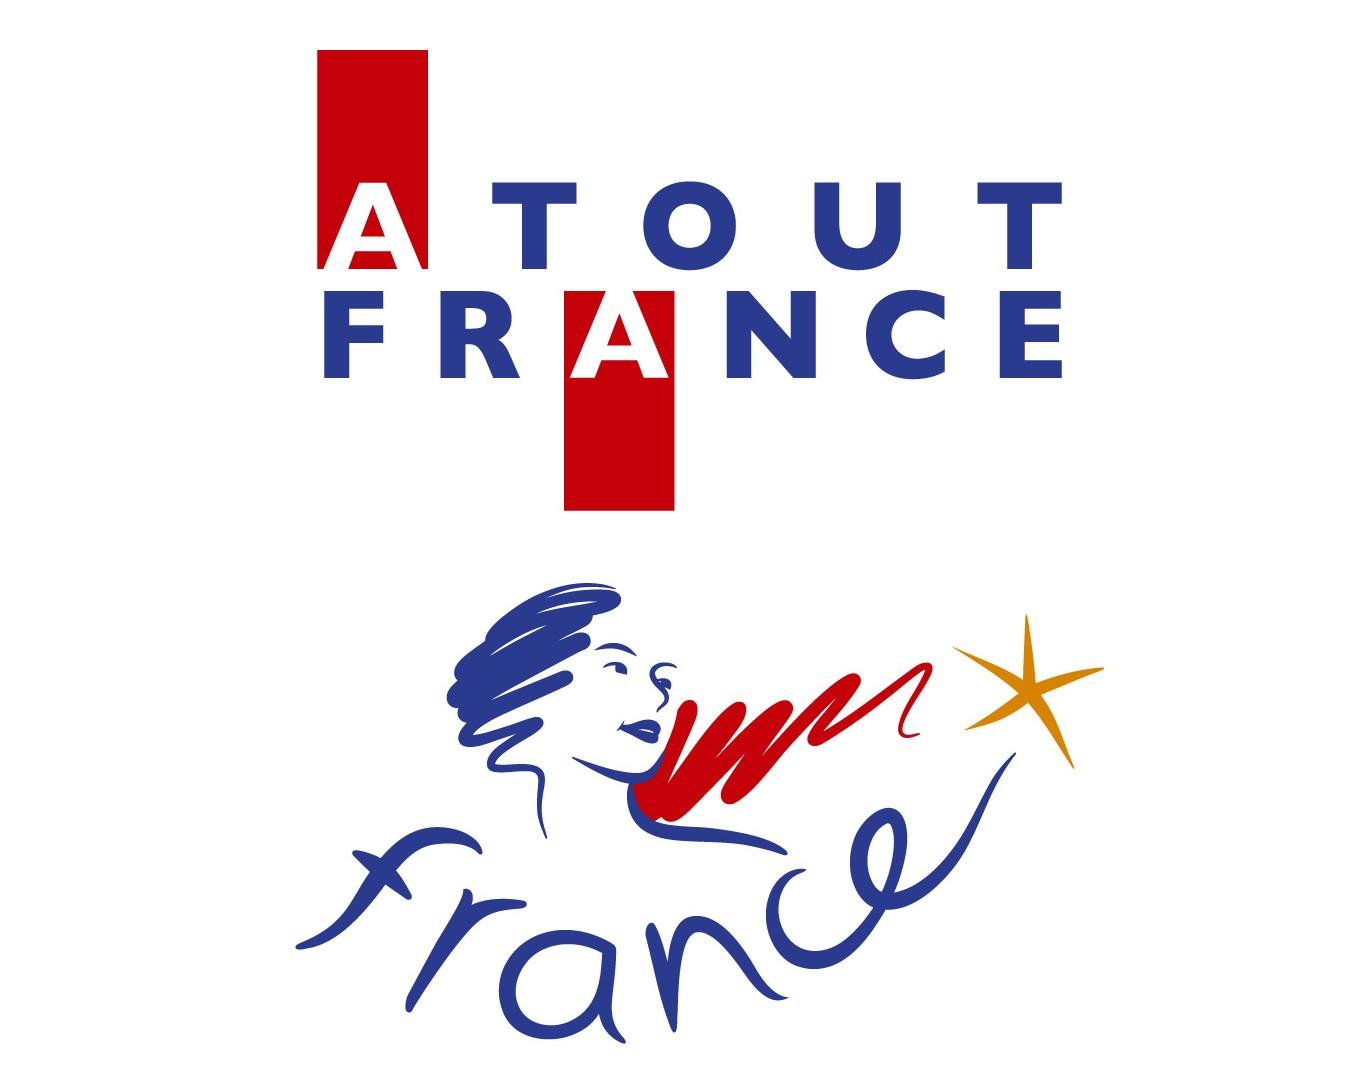 ATOUT-FRANCE-TURISTAS-MILLENNIALS-ESTUDIO-1